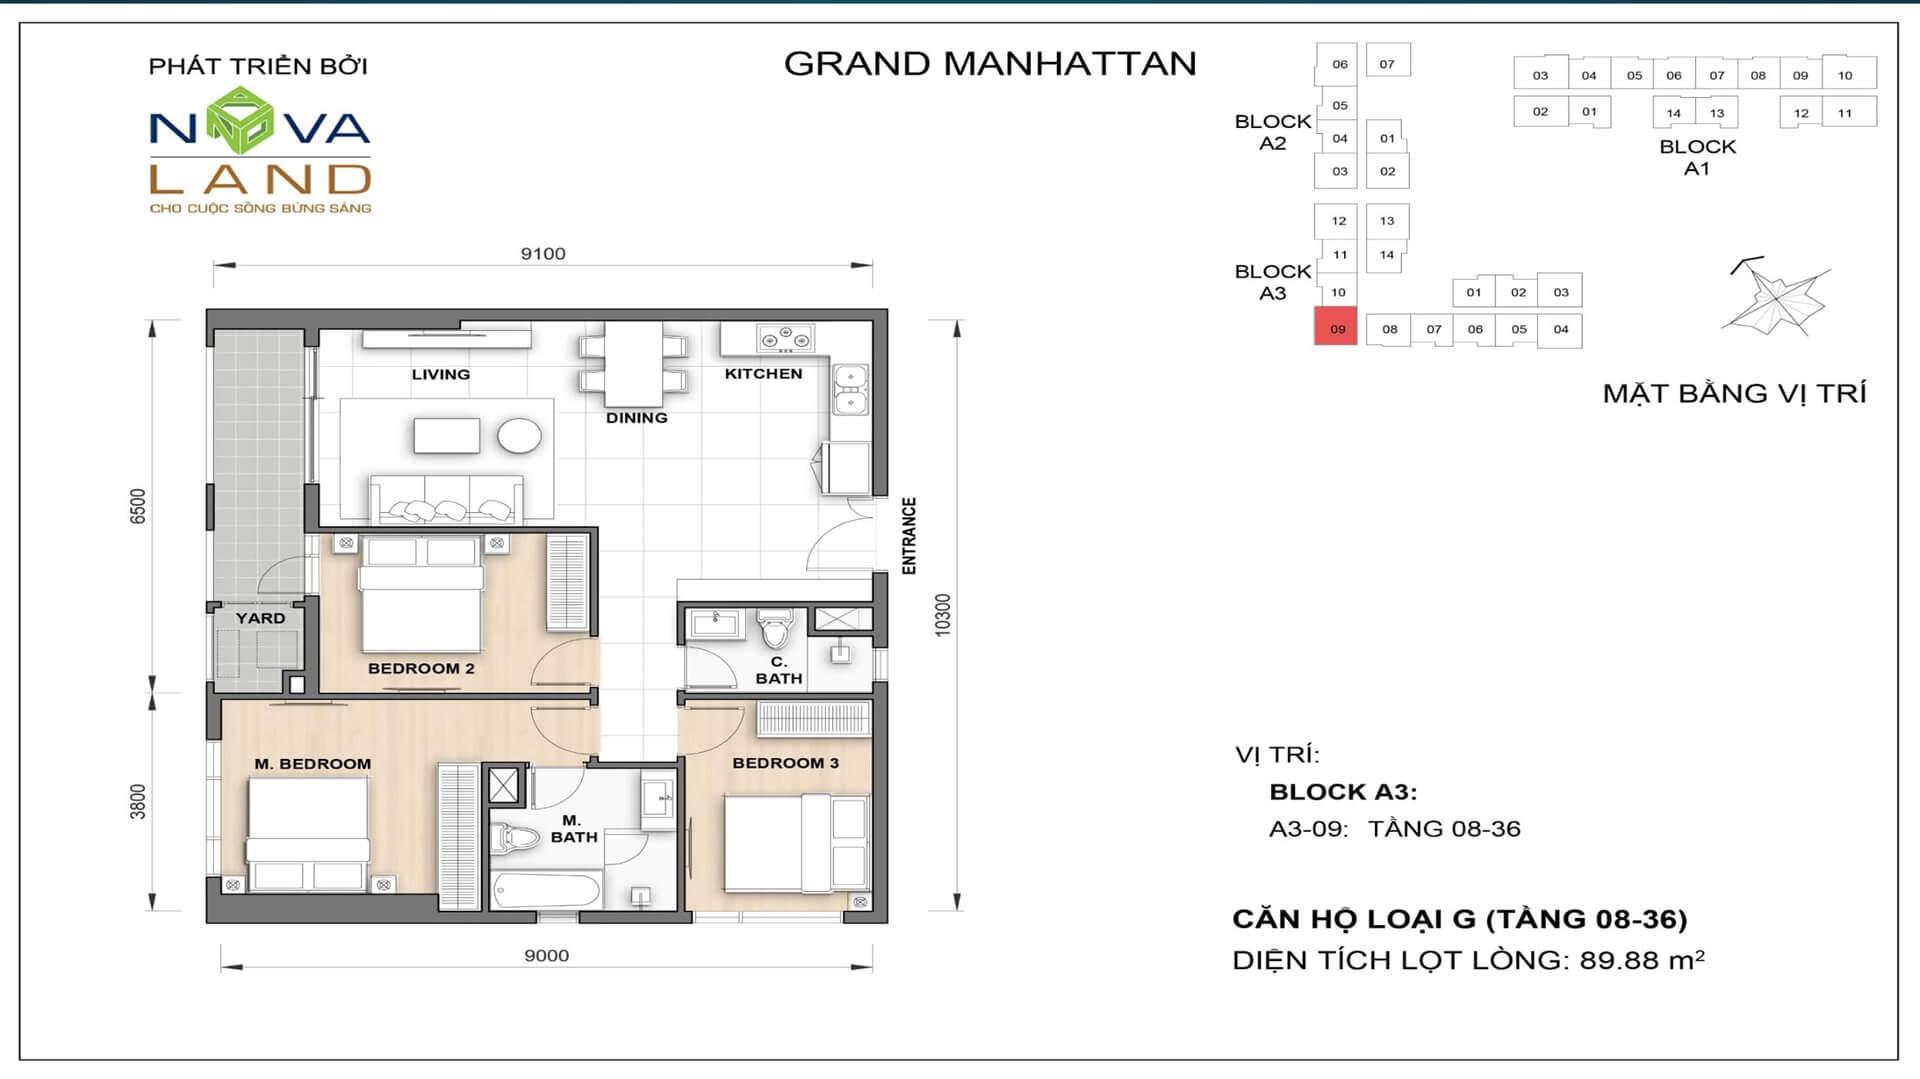 Ban-Ve-Ky-Thuat-Can-Ho-Du-An-Grand-Manhattan-Q1-HCM-Novaland-dien-tich-lot-long-89.88m2-3PN